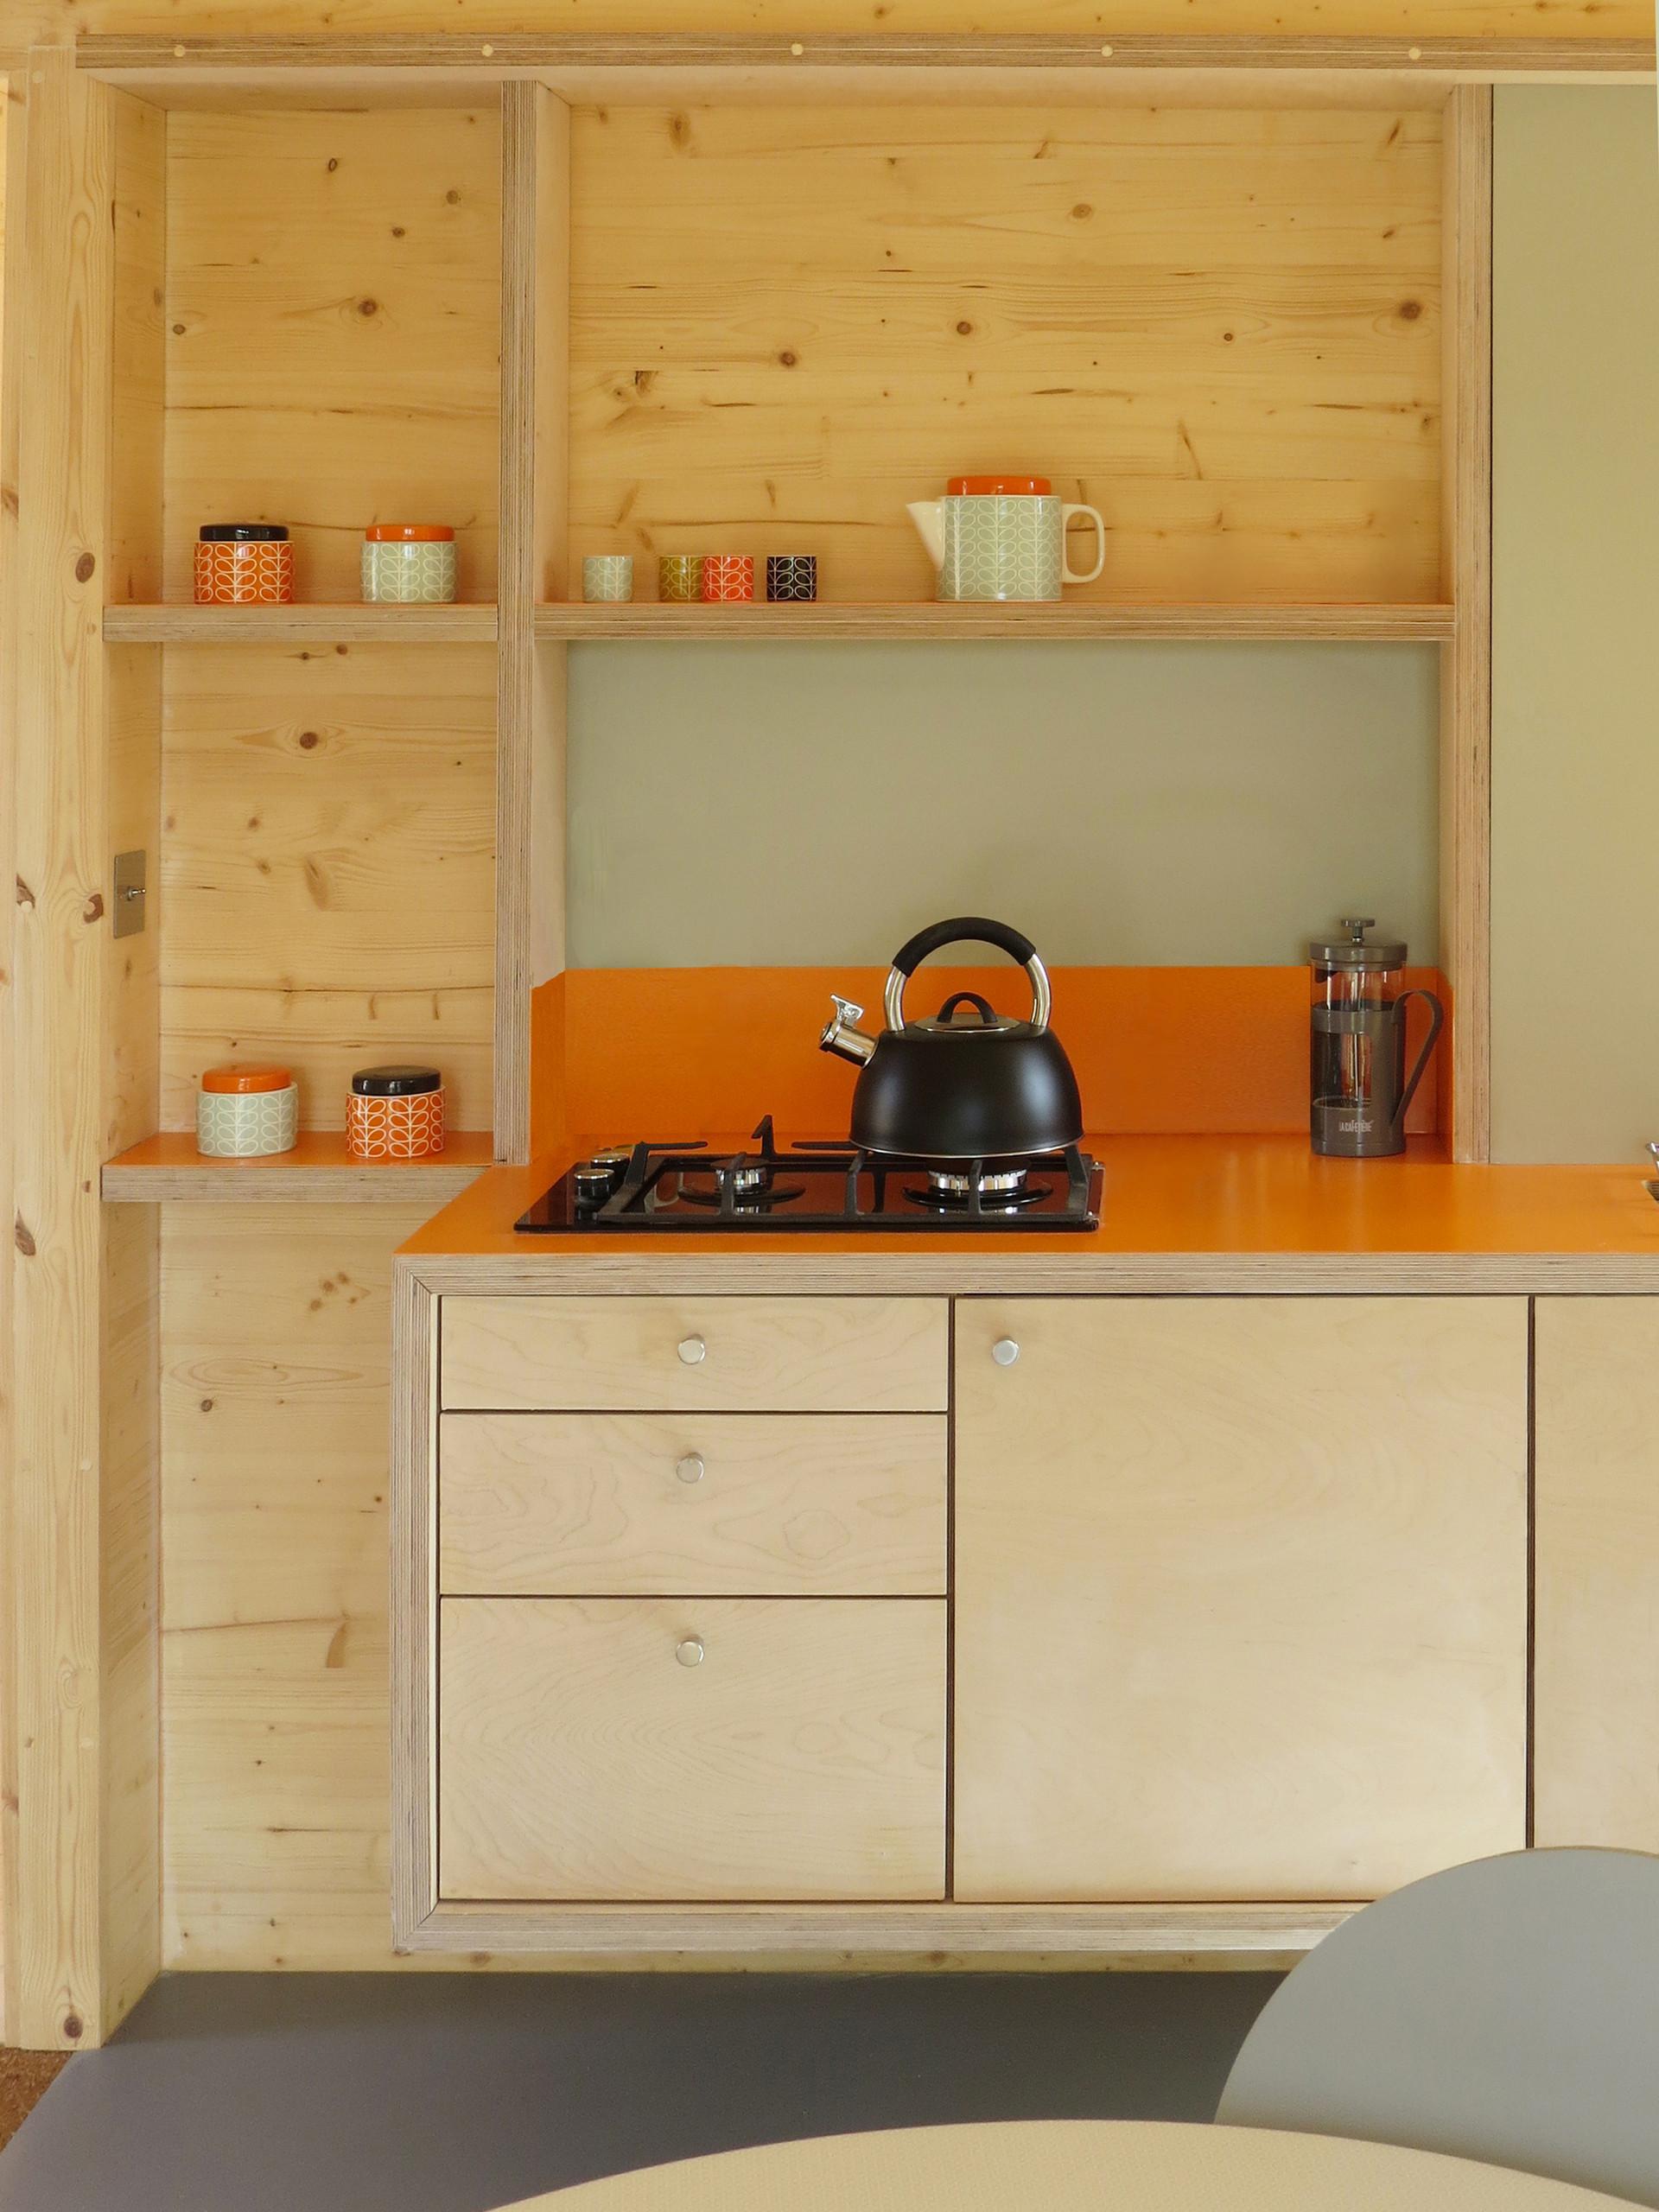 Artist studio, kitchen